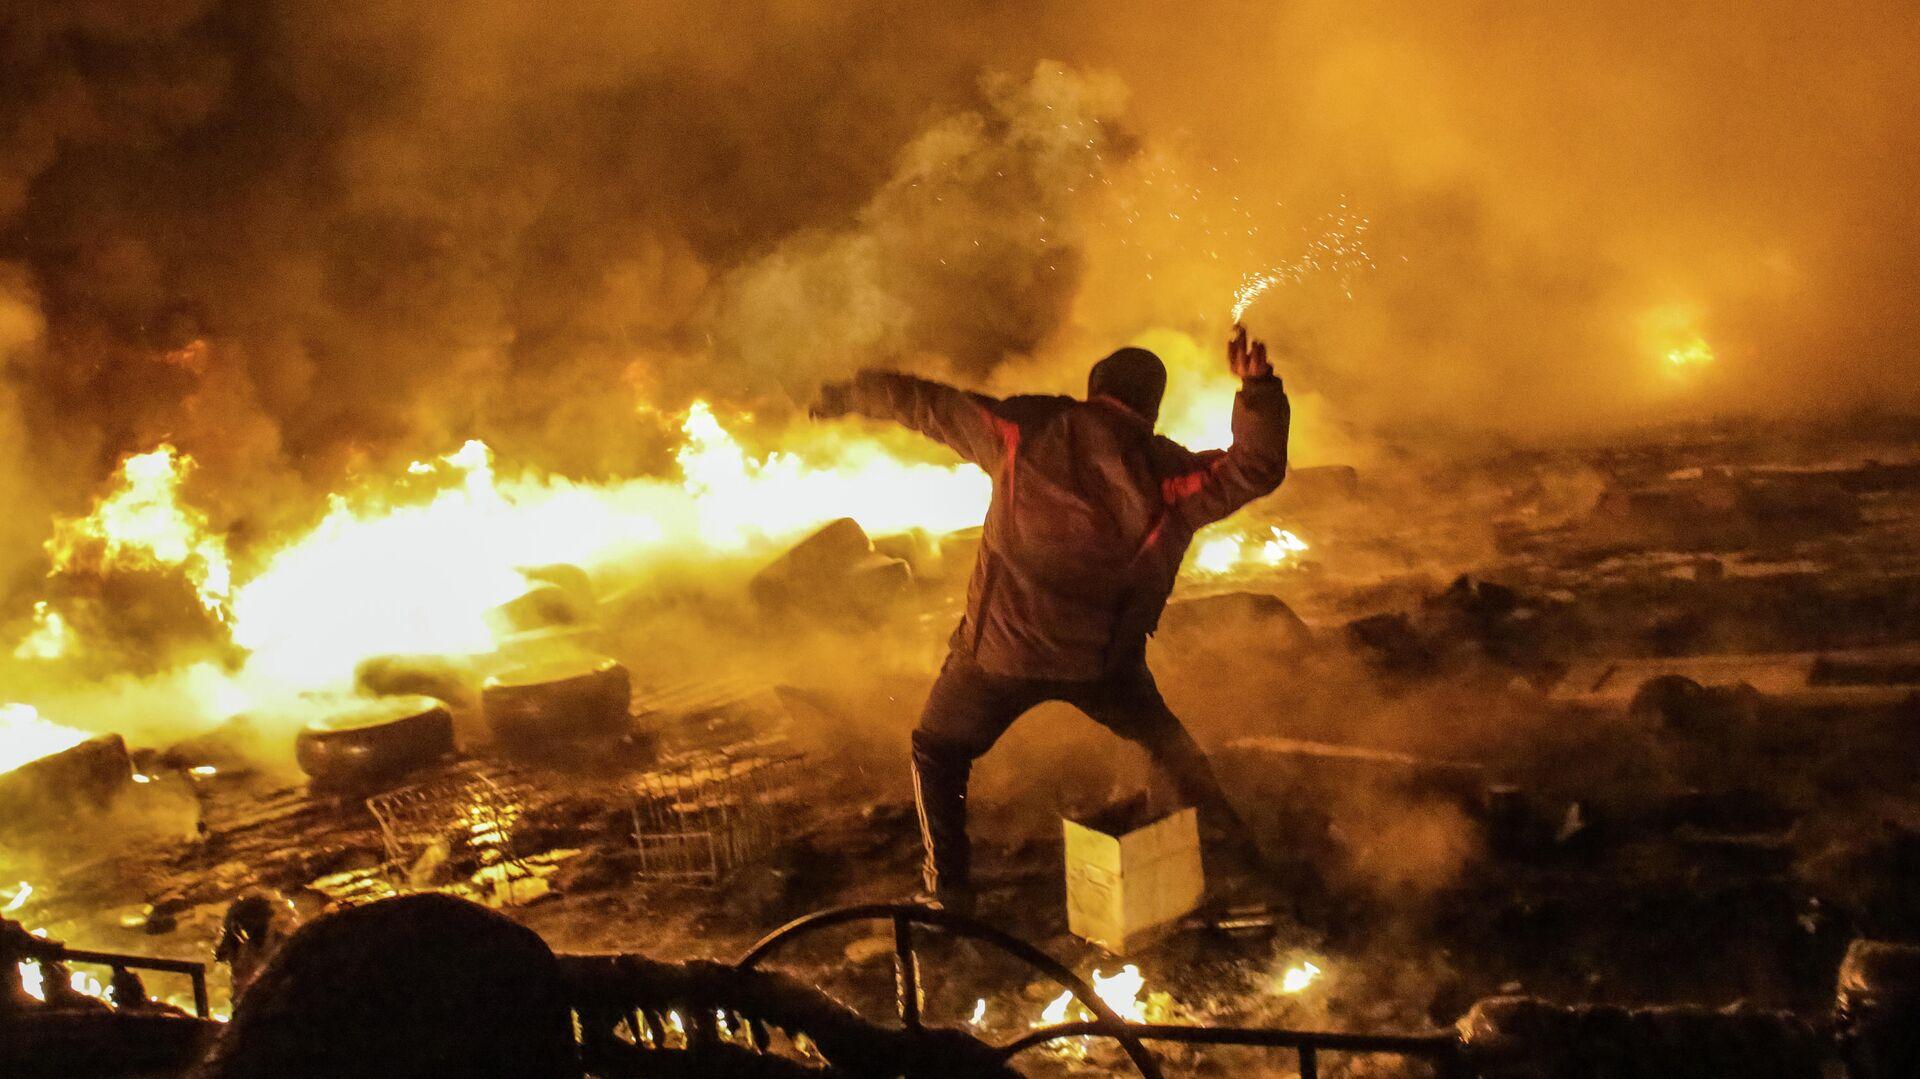 Столкновения в центре Киева. 2014 год - РИА Новости, 1920, 10.06.2021